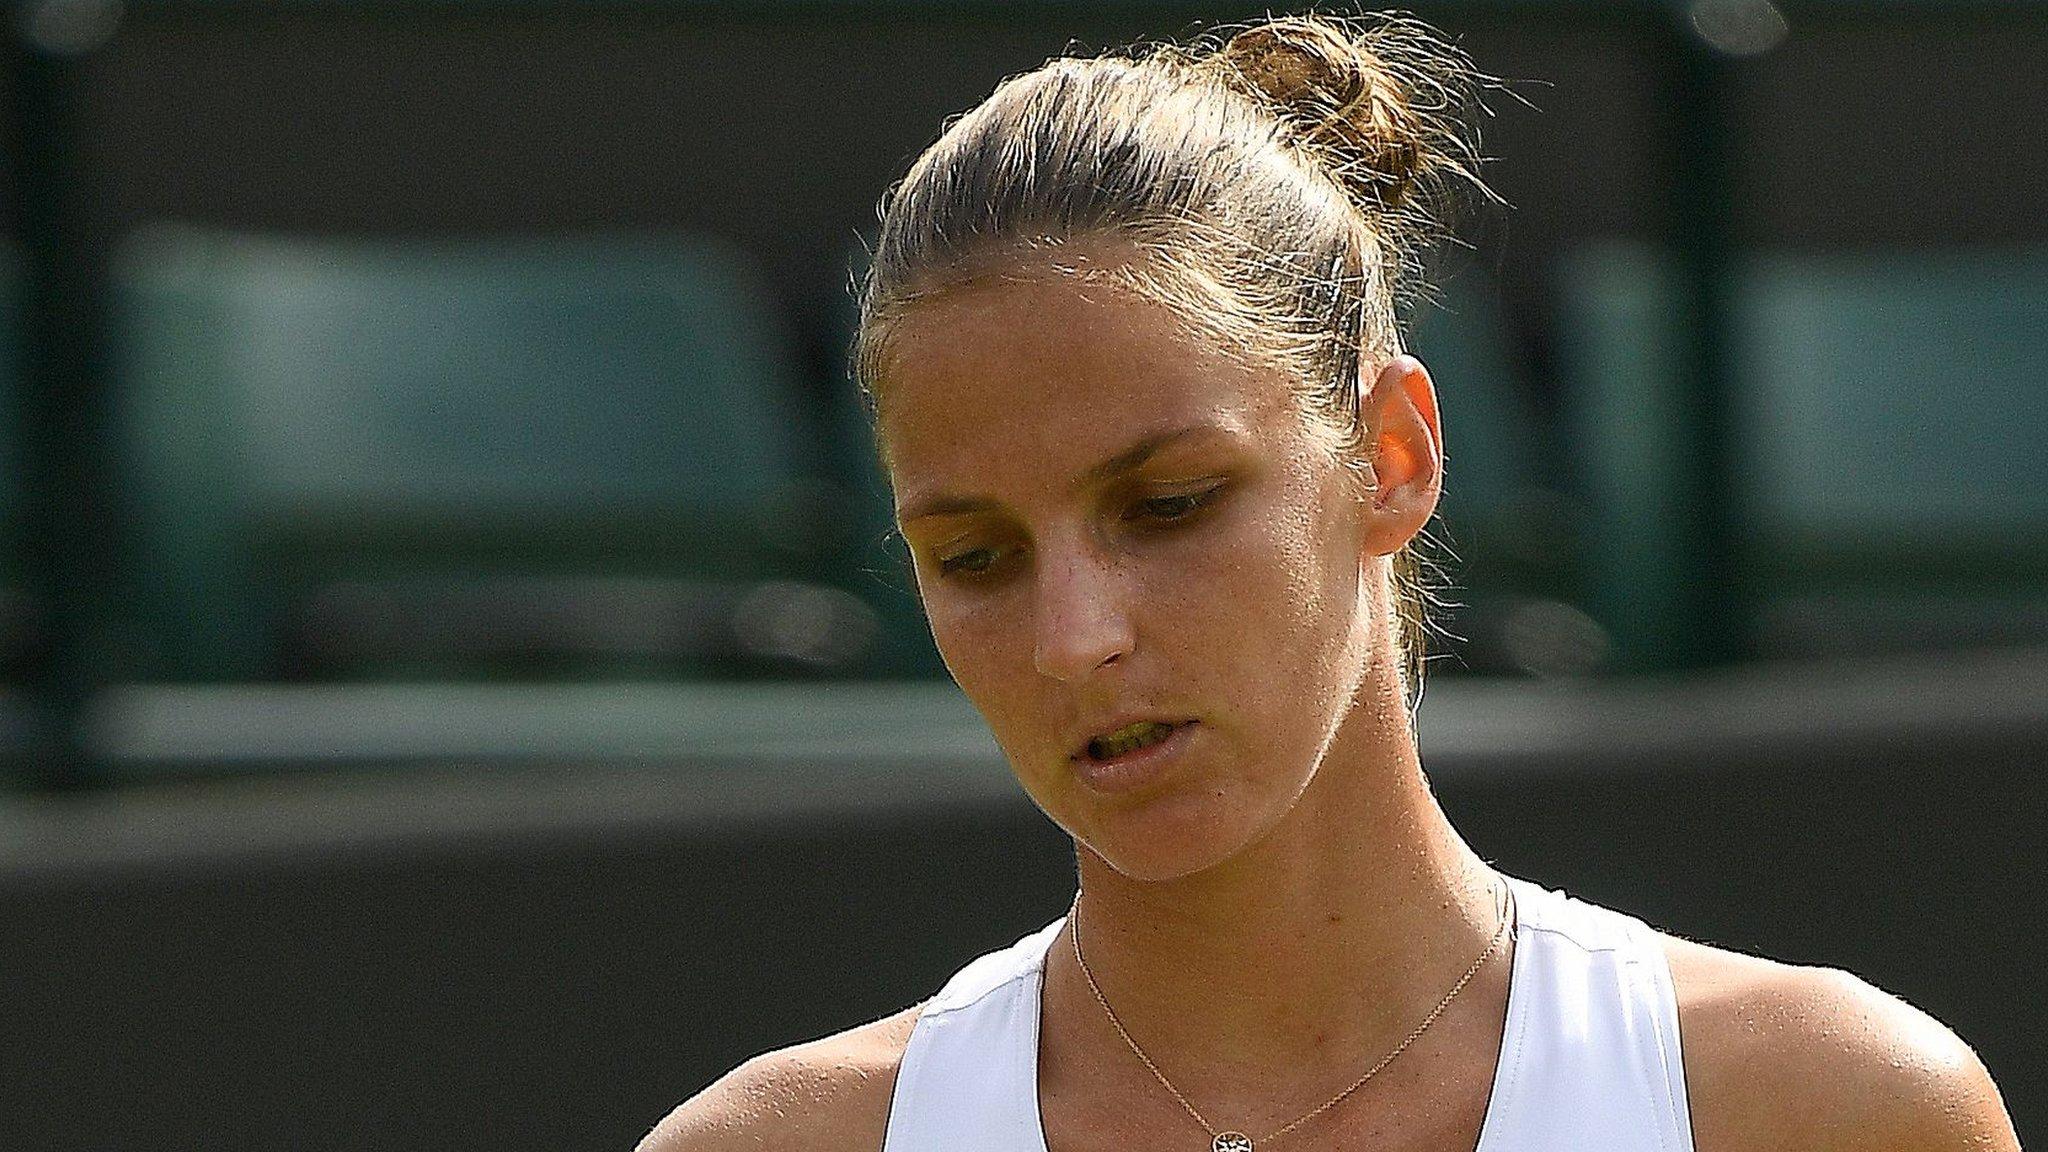 Birmingham Classic: Karolina Pliskova beaten by Magdalena Rybarikova in first round